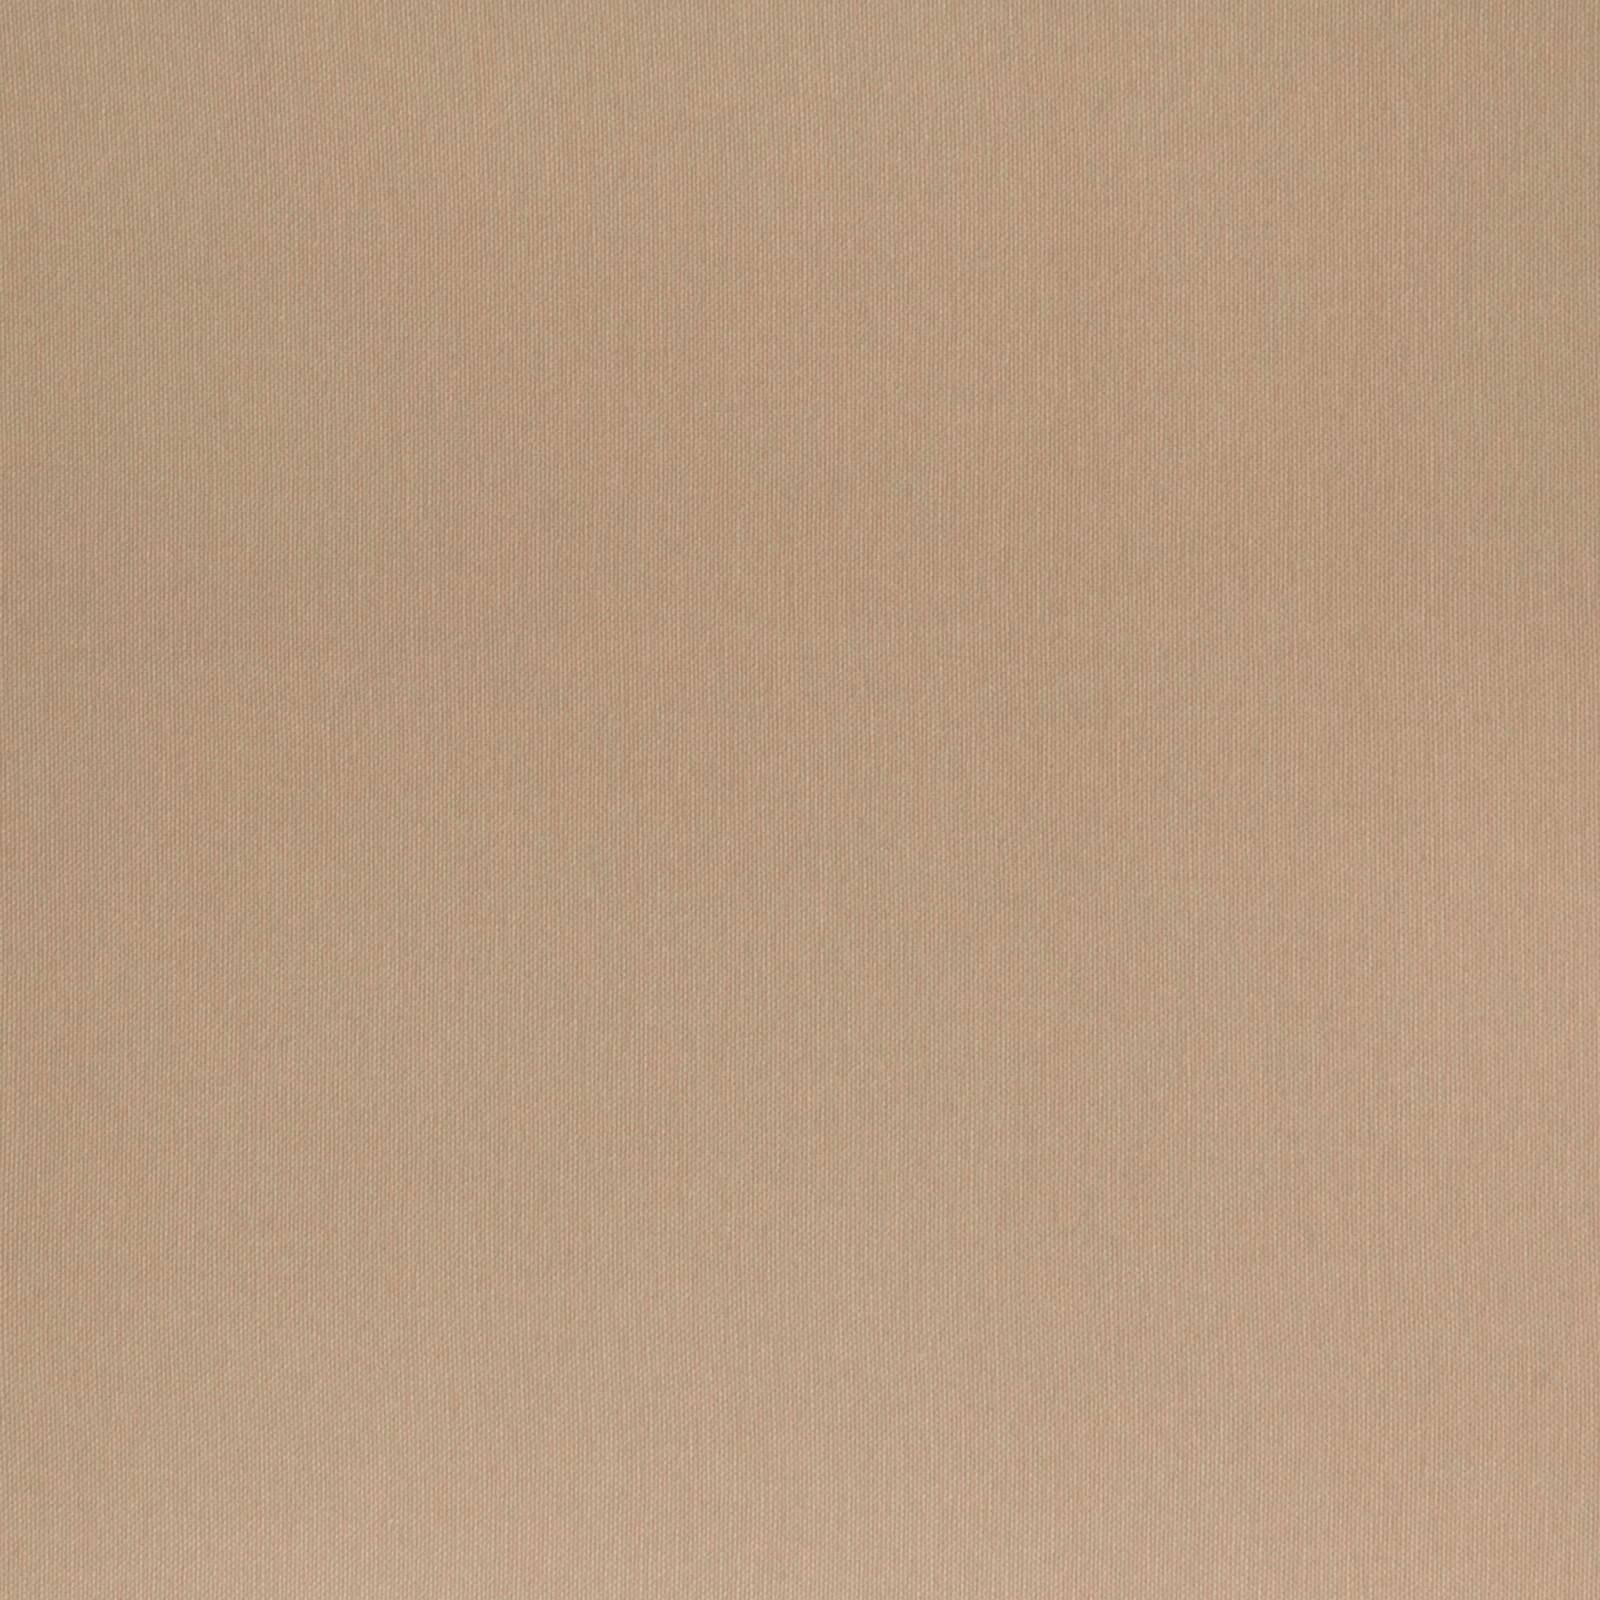 b4261 simtex beige greenhouse fabrics. Black Bedroom Furniture Sets. Home Design Ideas